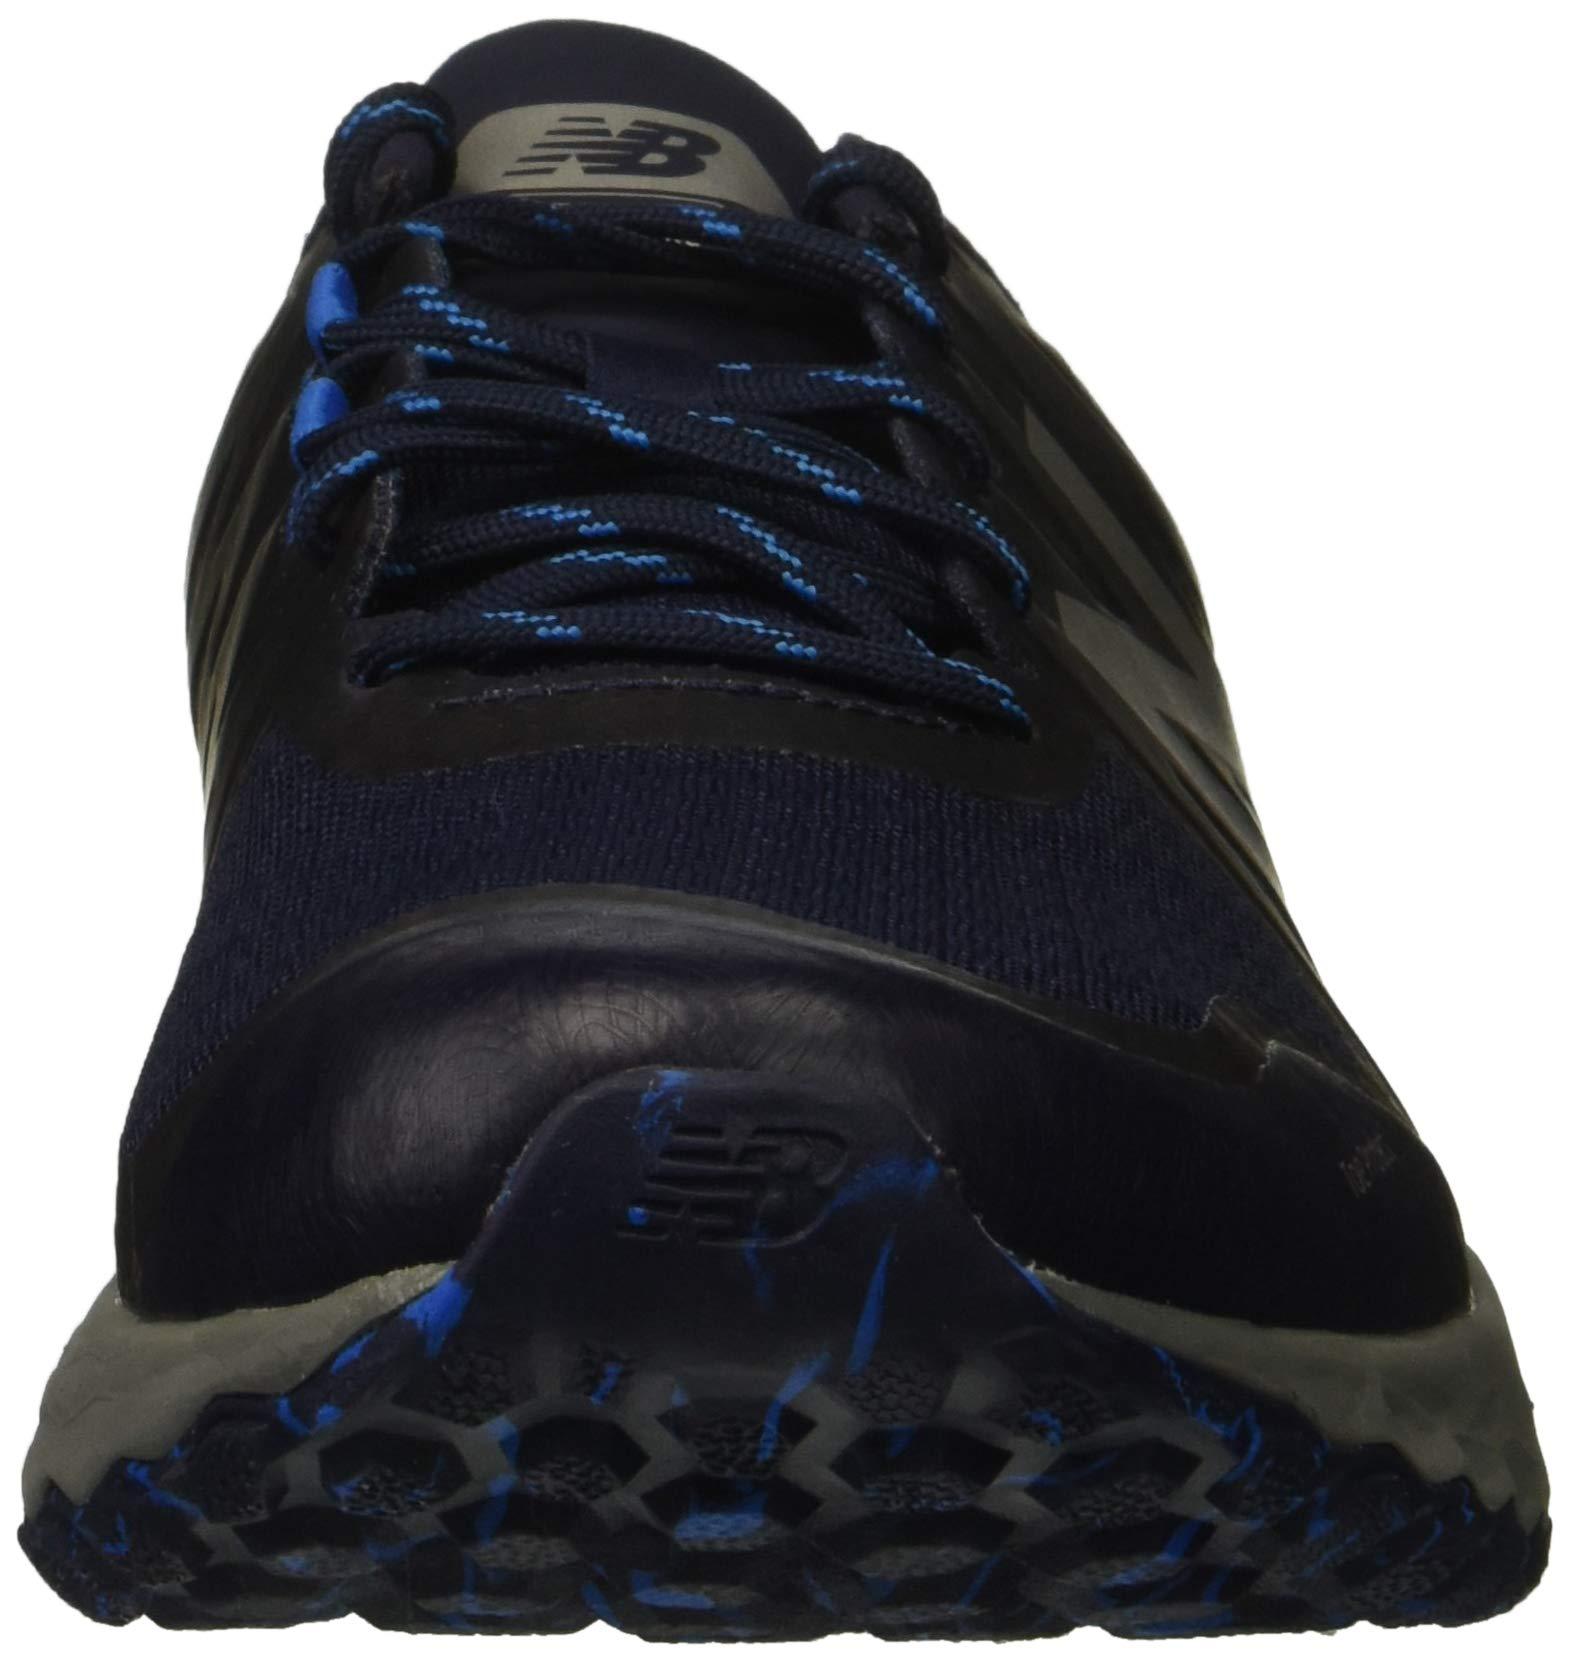 New Balance Men's Kaymin V1 Fresh Foam Trail Running Shoe Pigment/Laser Blue 1.5 D US by New Balance (Image #4)